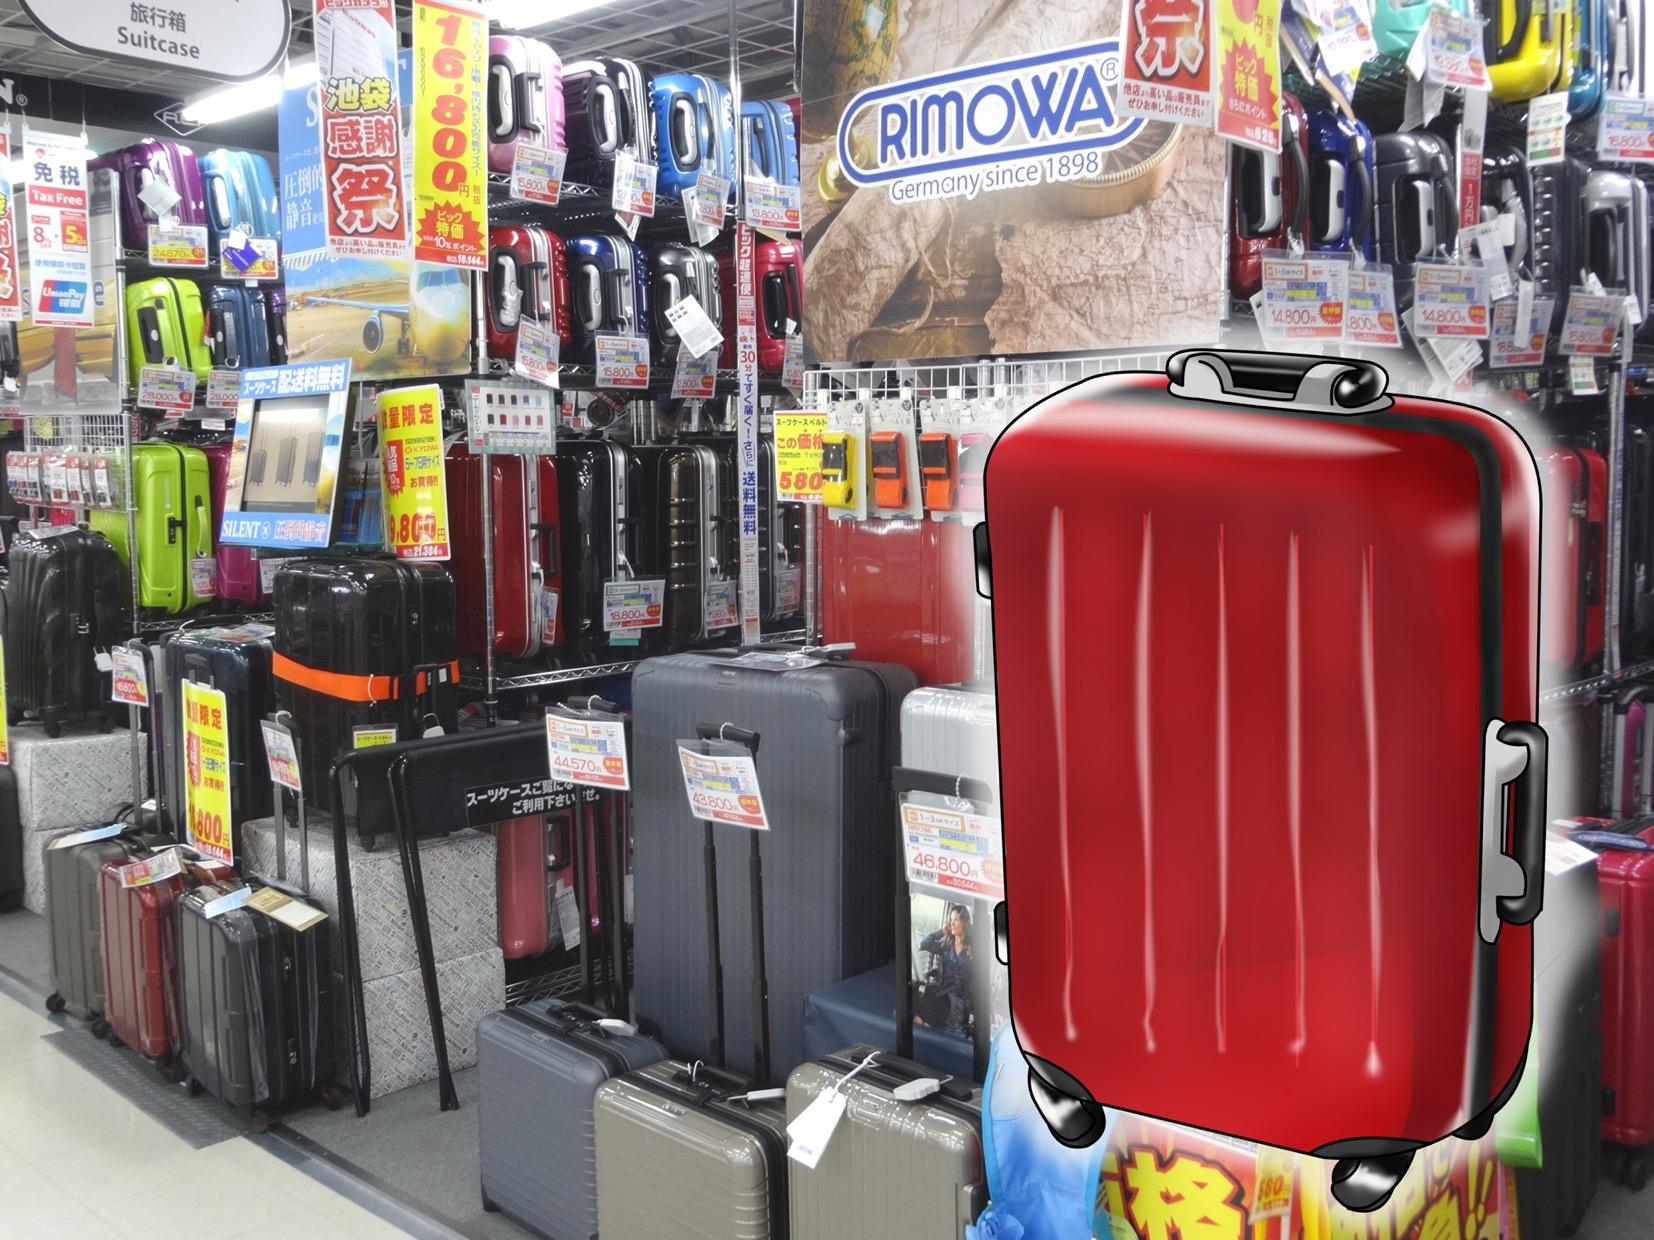 Air Bic Camera羽田機場國際線航廈店2號店